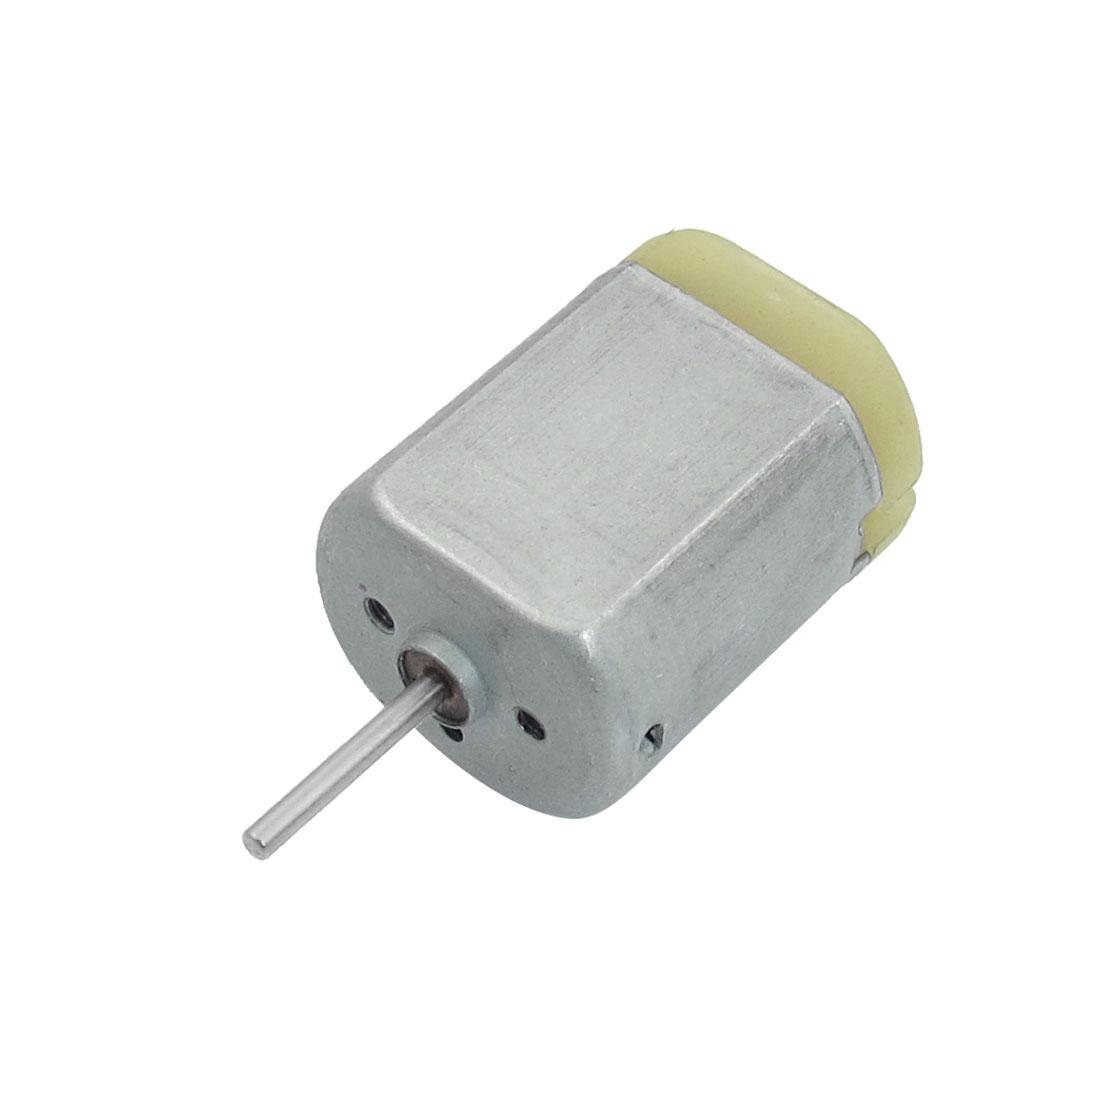 DC 12V 12000RPM 2mm Shaft Diameter 2-Terminal Flat Magnetic Motor